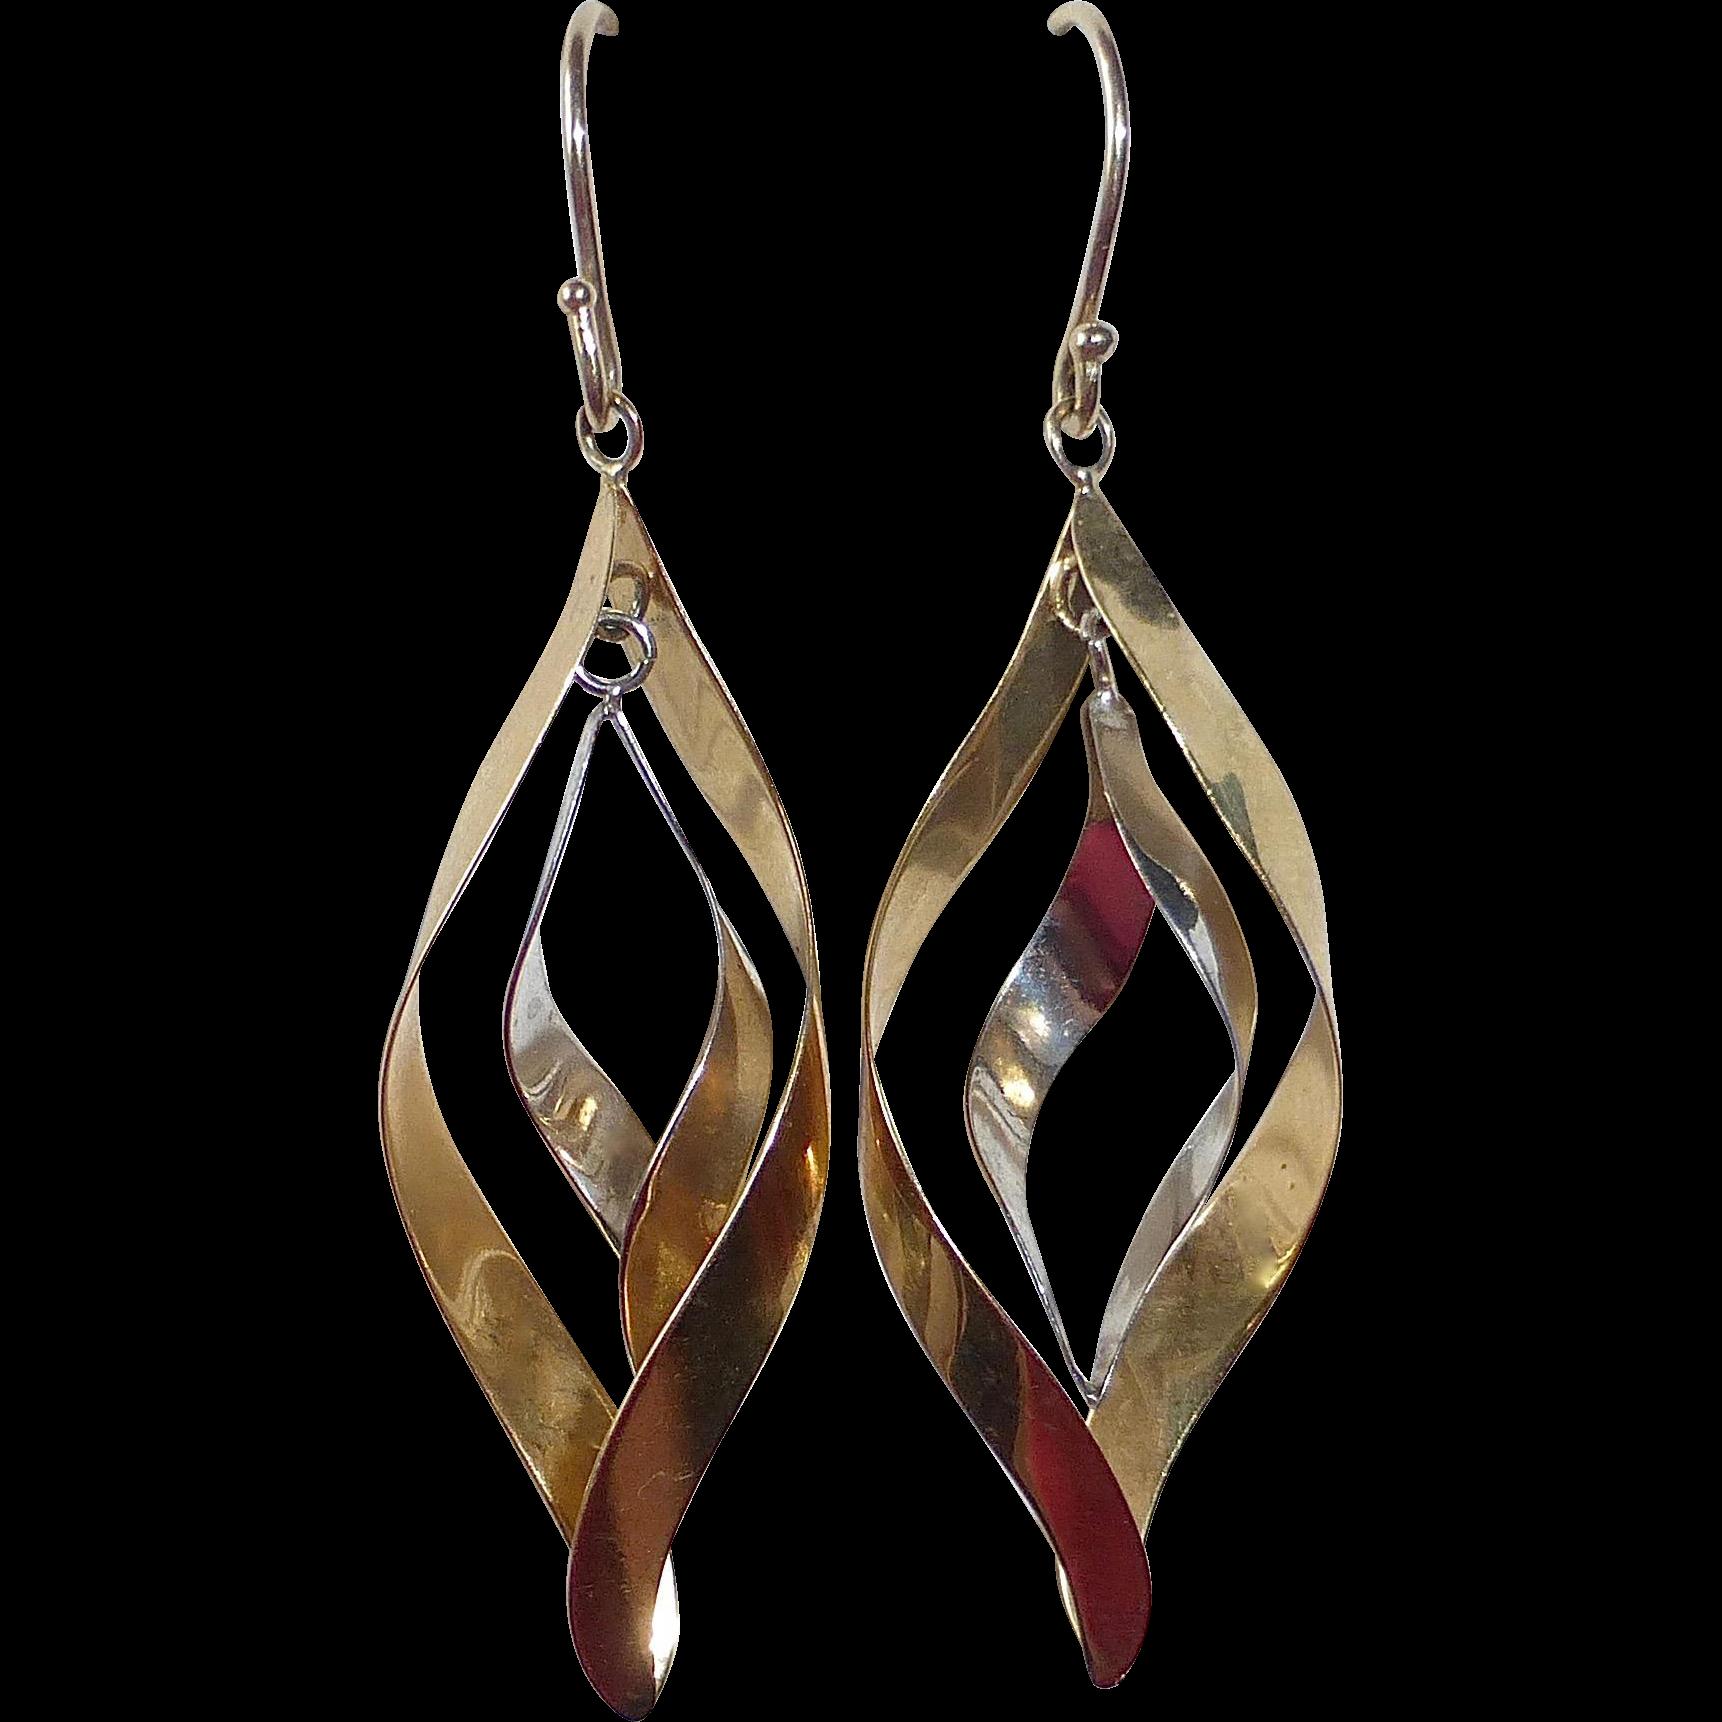 14k Yellow & White Gold Drop Earrings